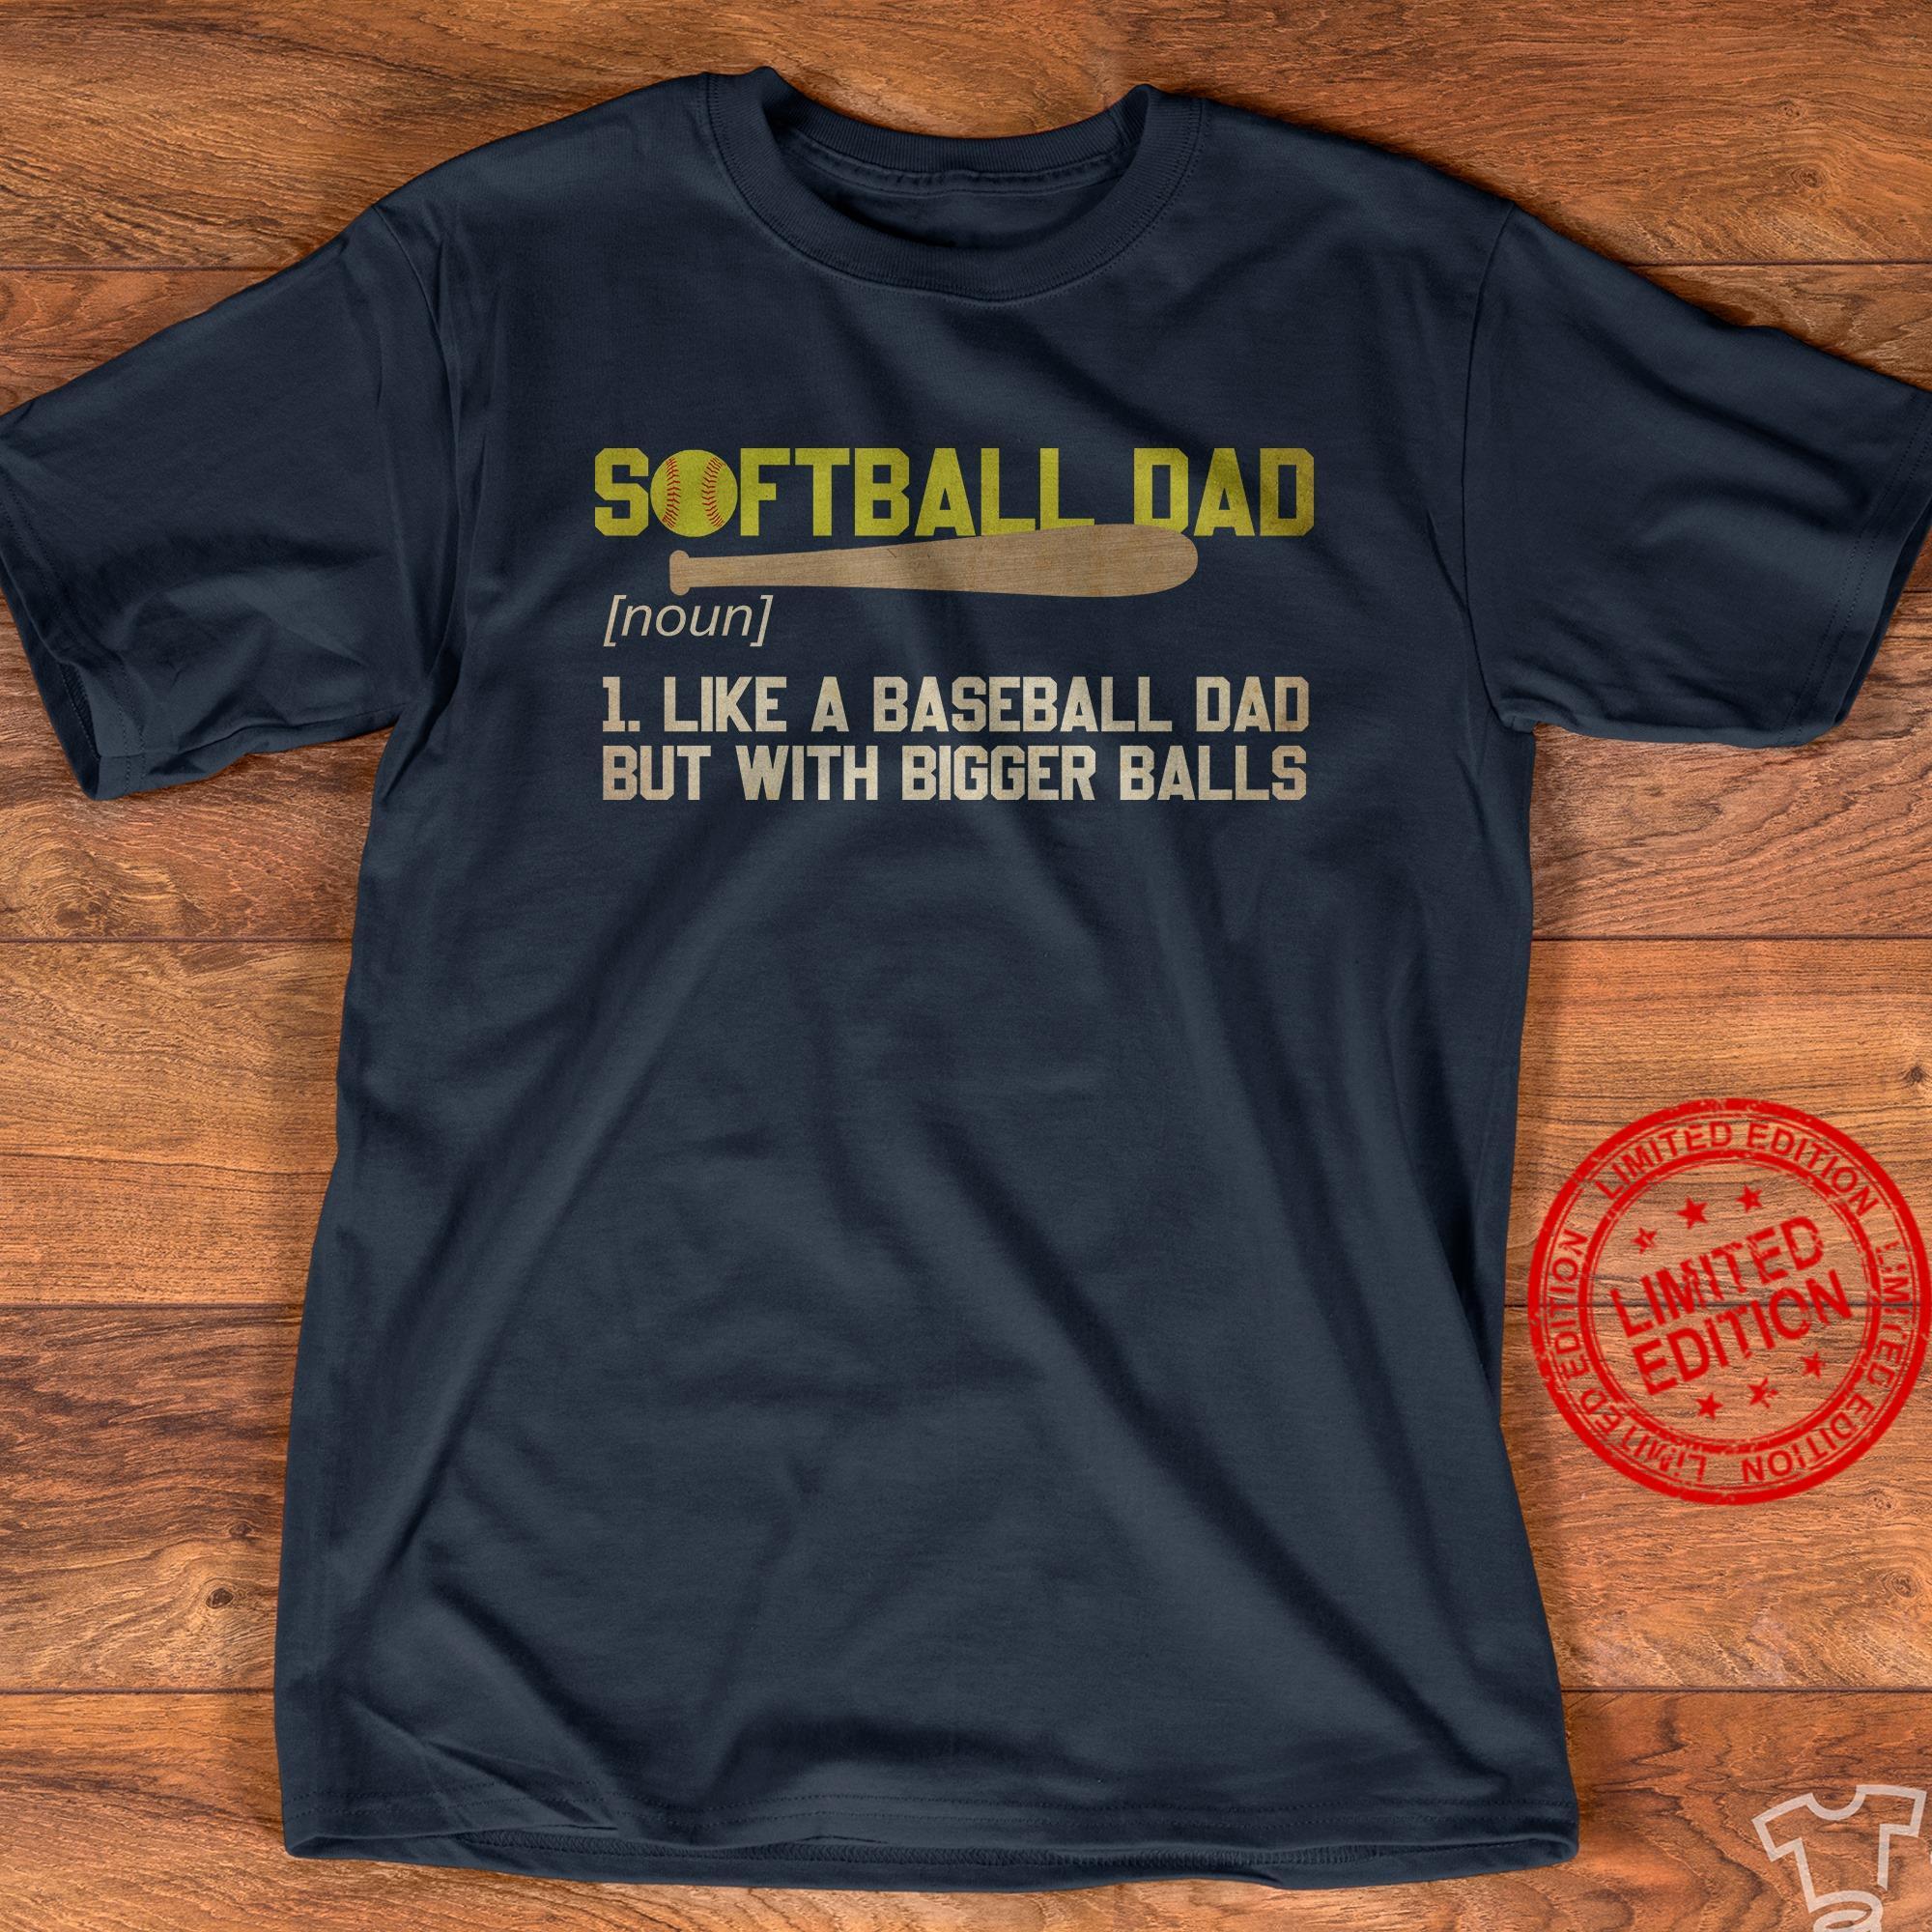 Softball Dad Noun 1 Like A Baseball Dad But With Bigger Balls Shirt